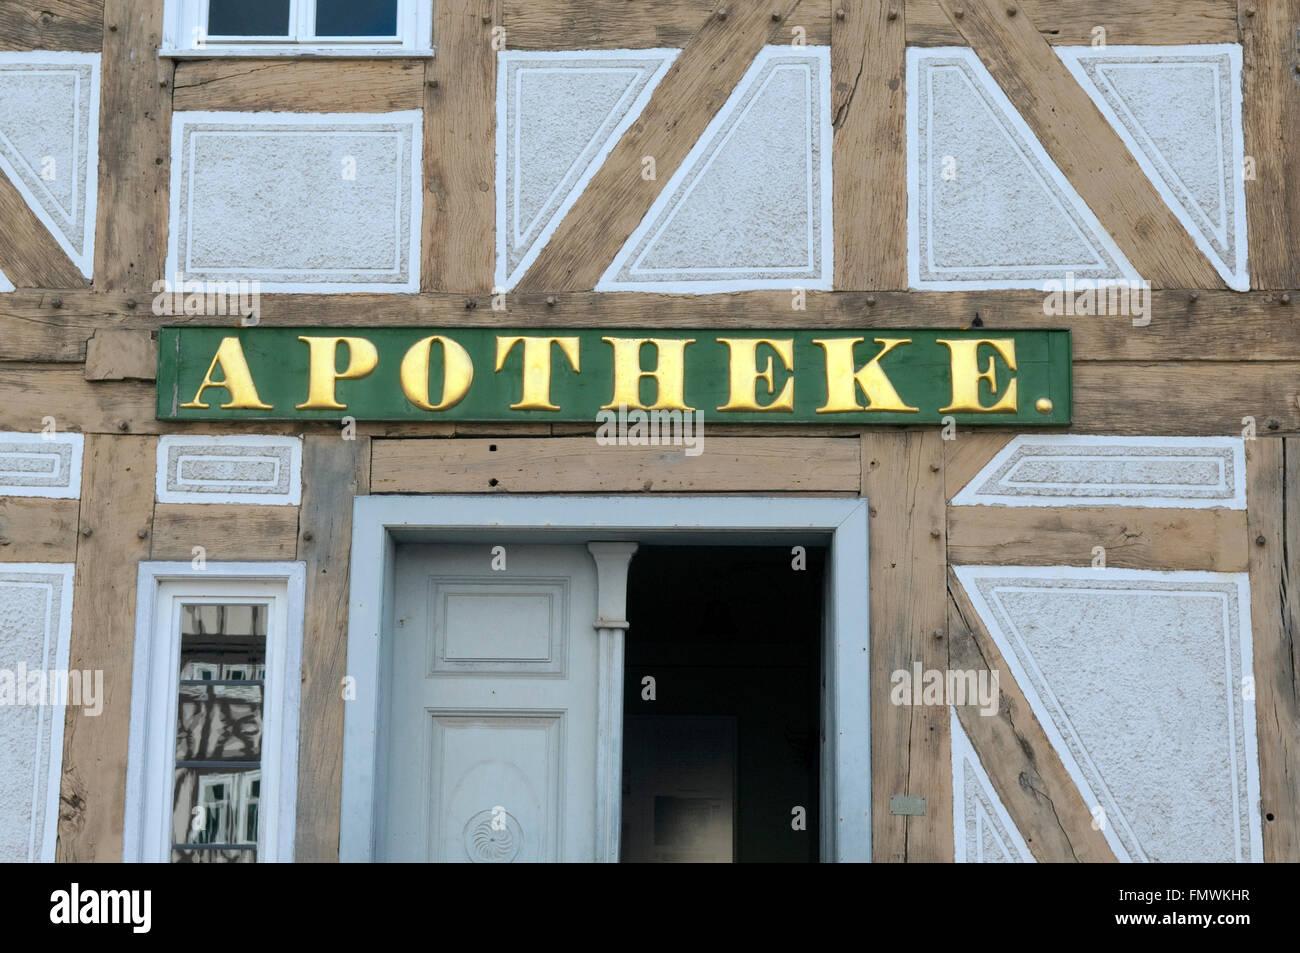 Apothekenschild - Stock Image